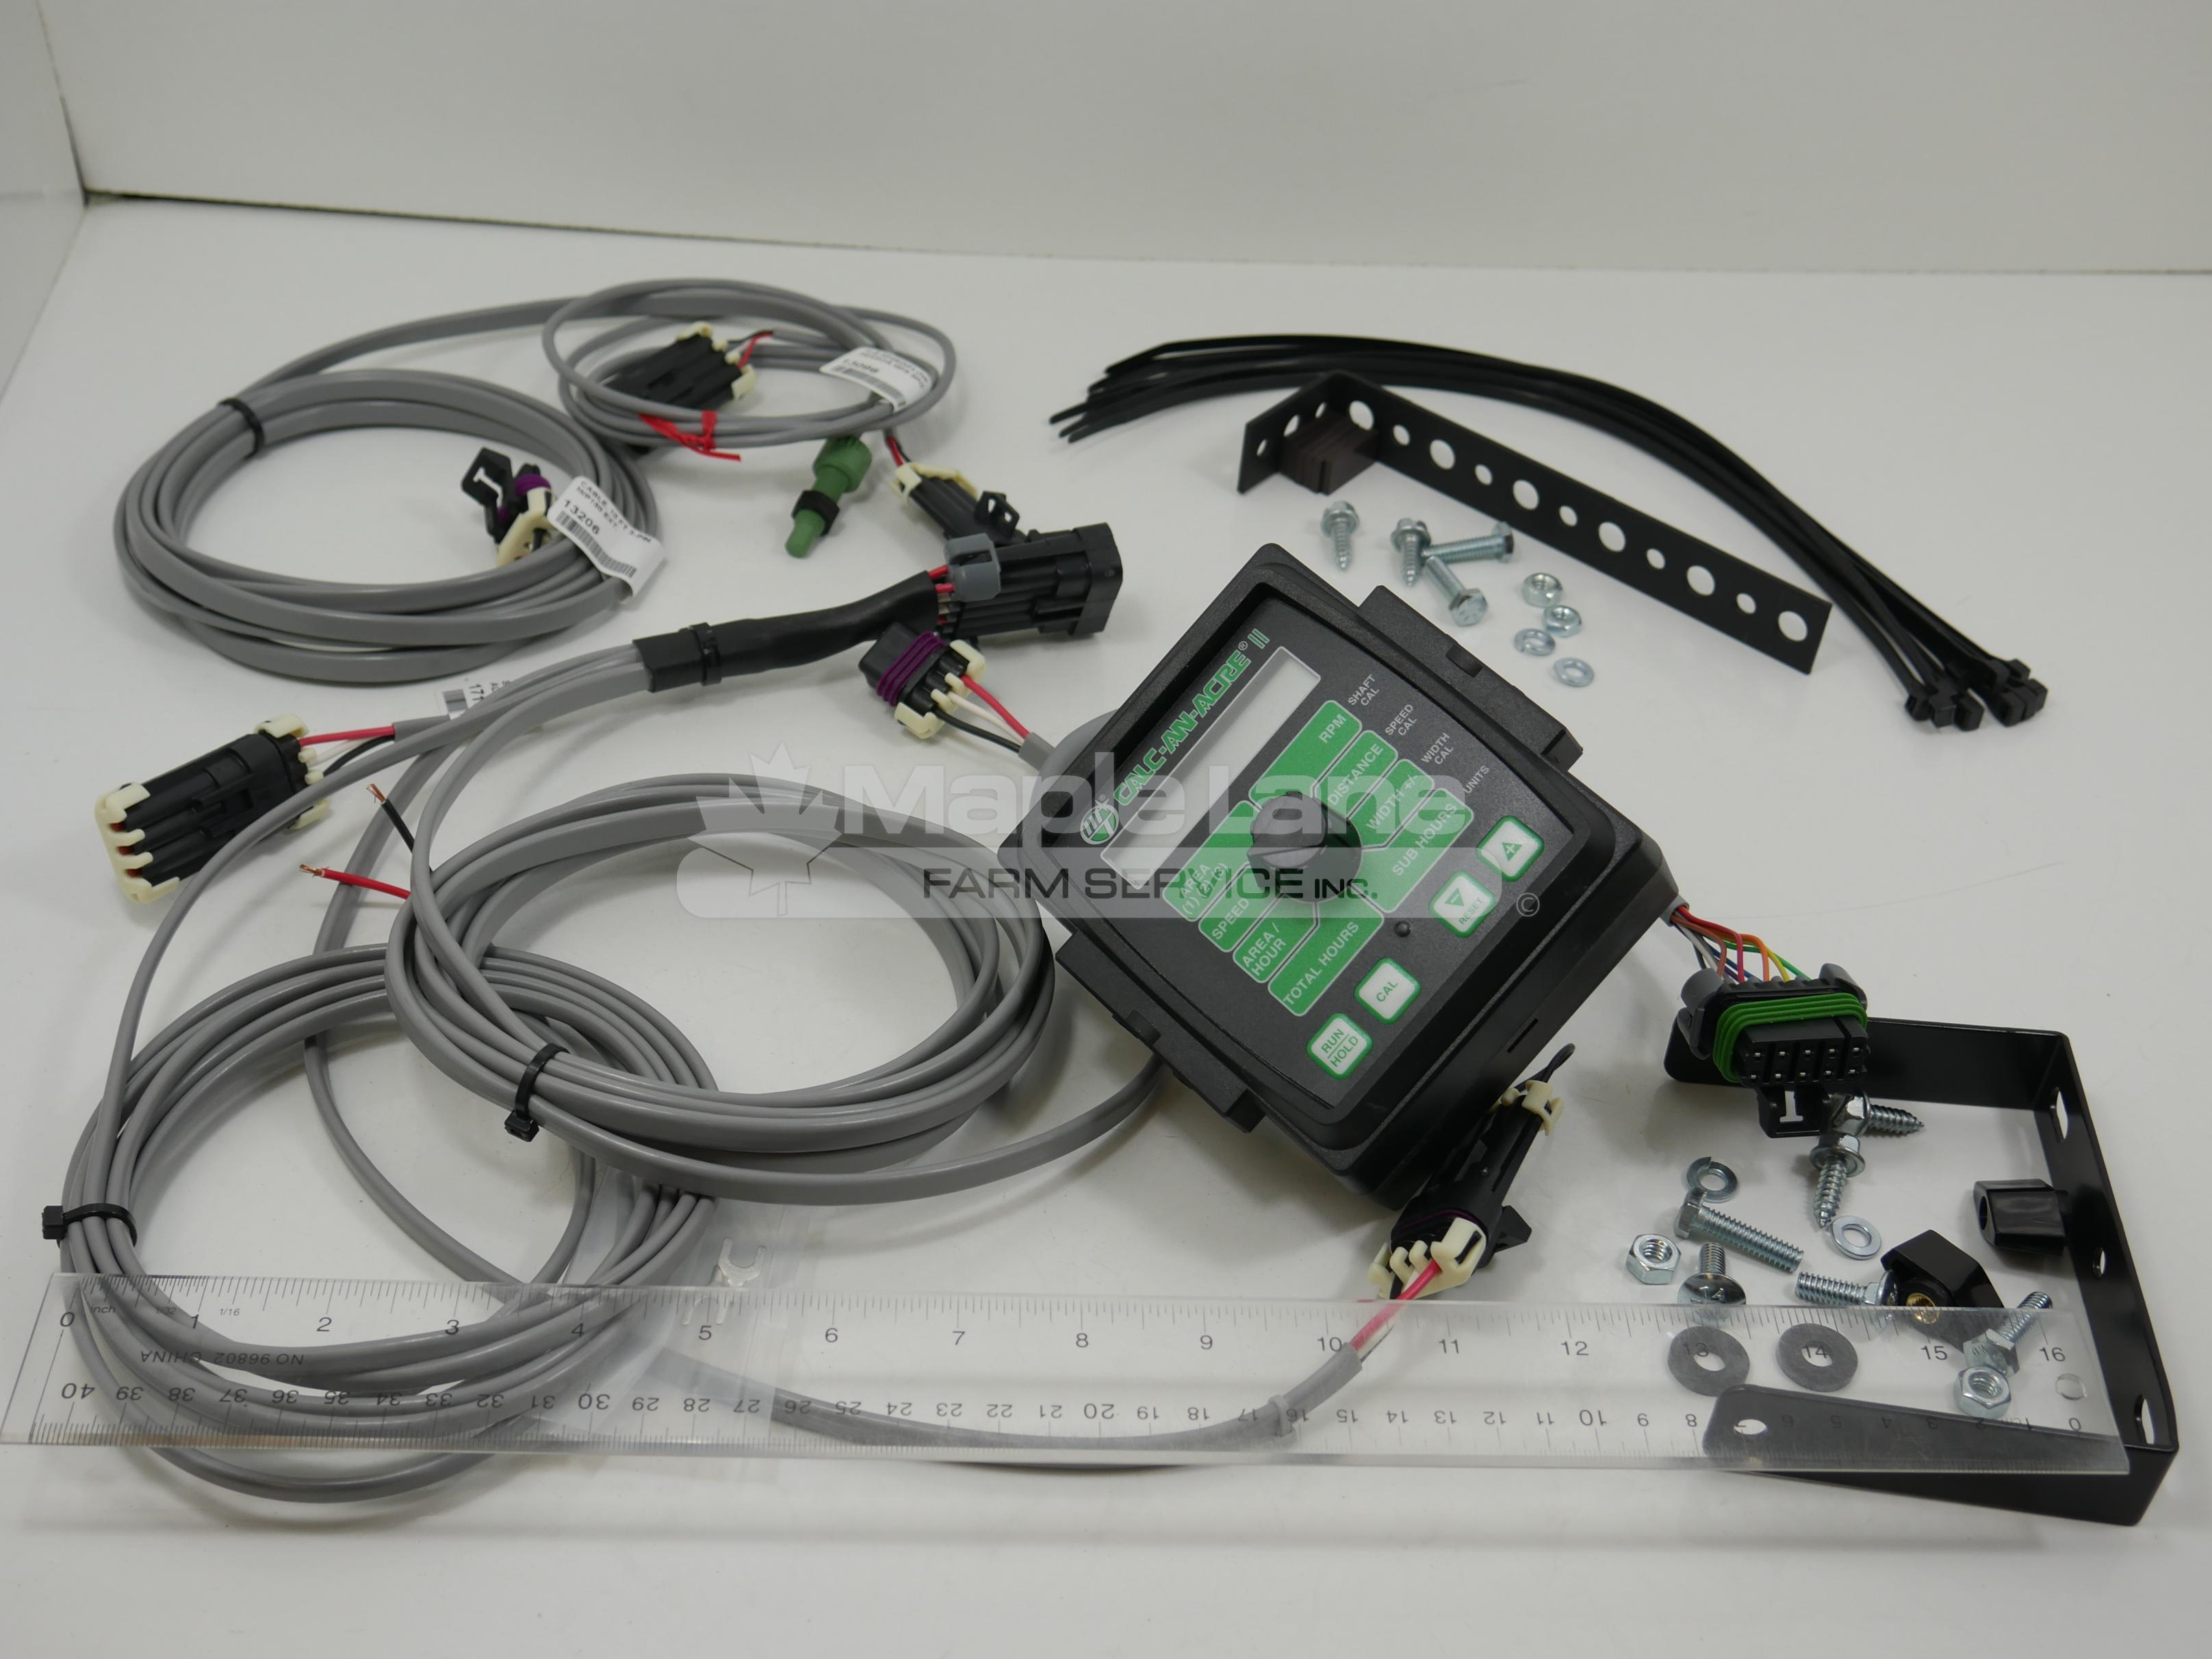 AG726223 Monitor